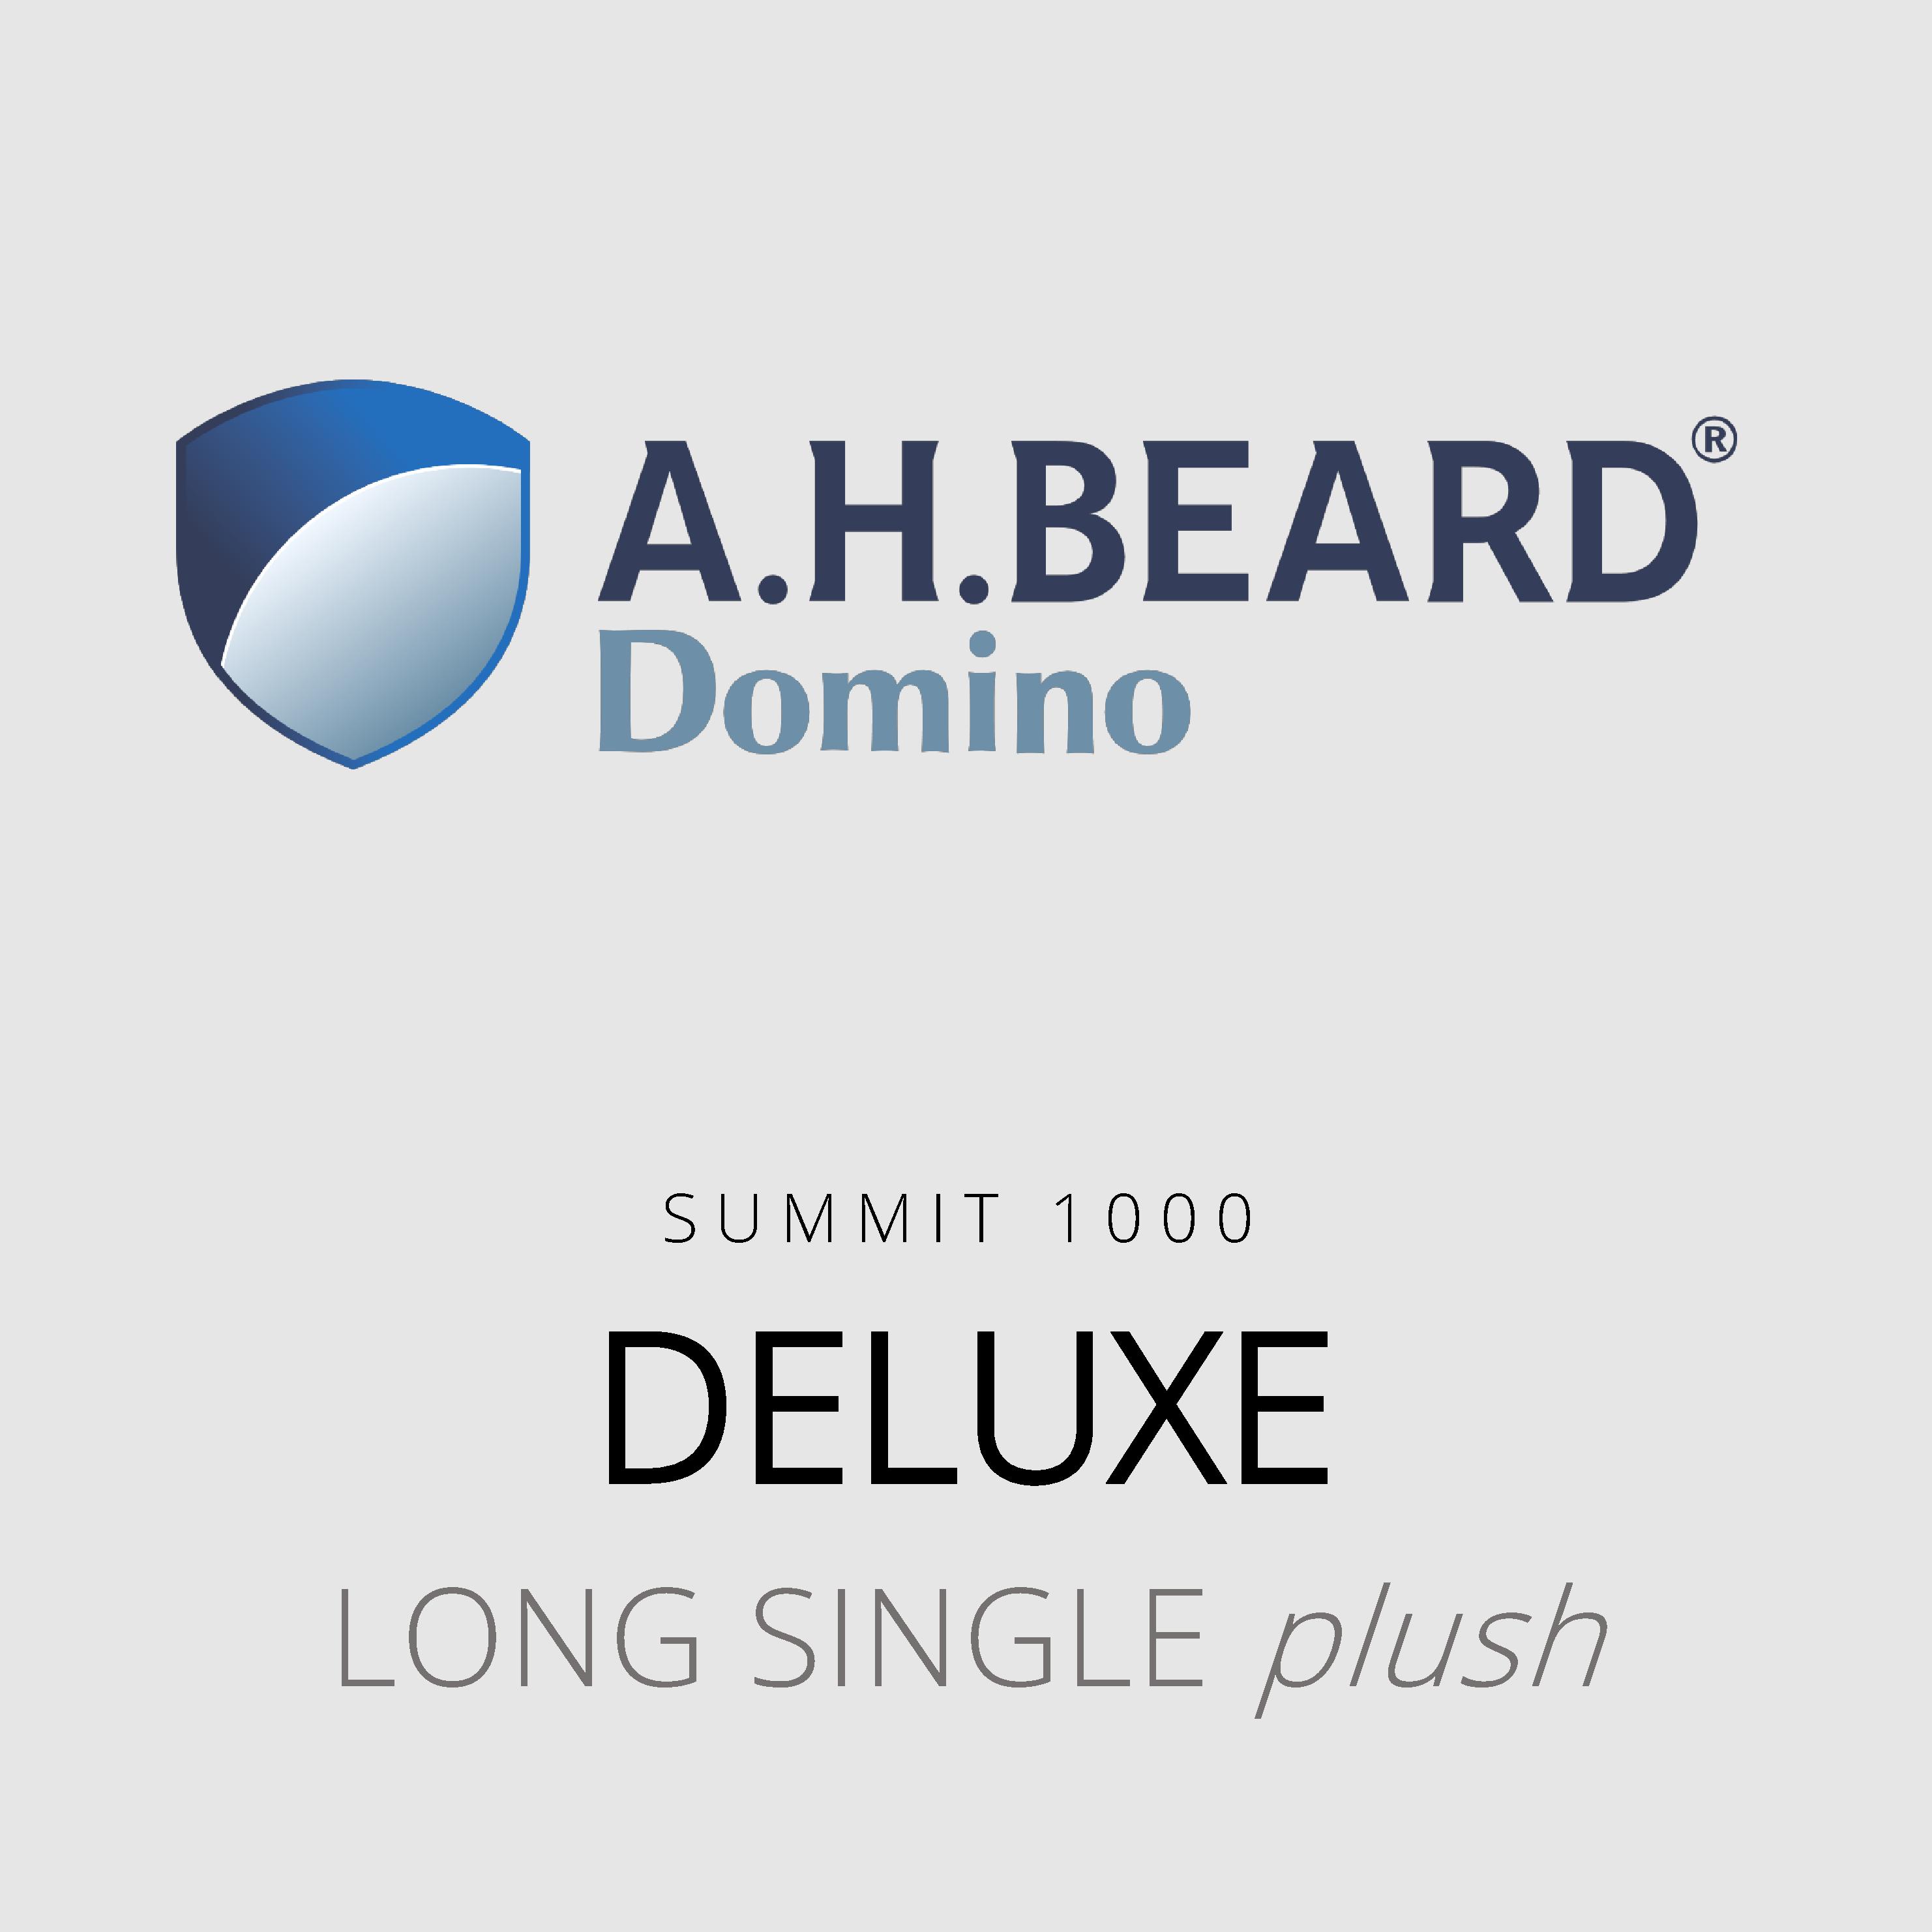 AH Beard Domino – Deluxe – Summit 1000 – Long Single Plush Mattress